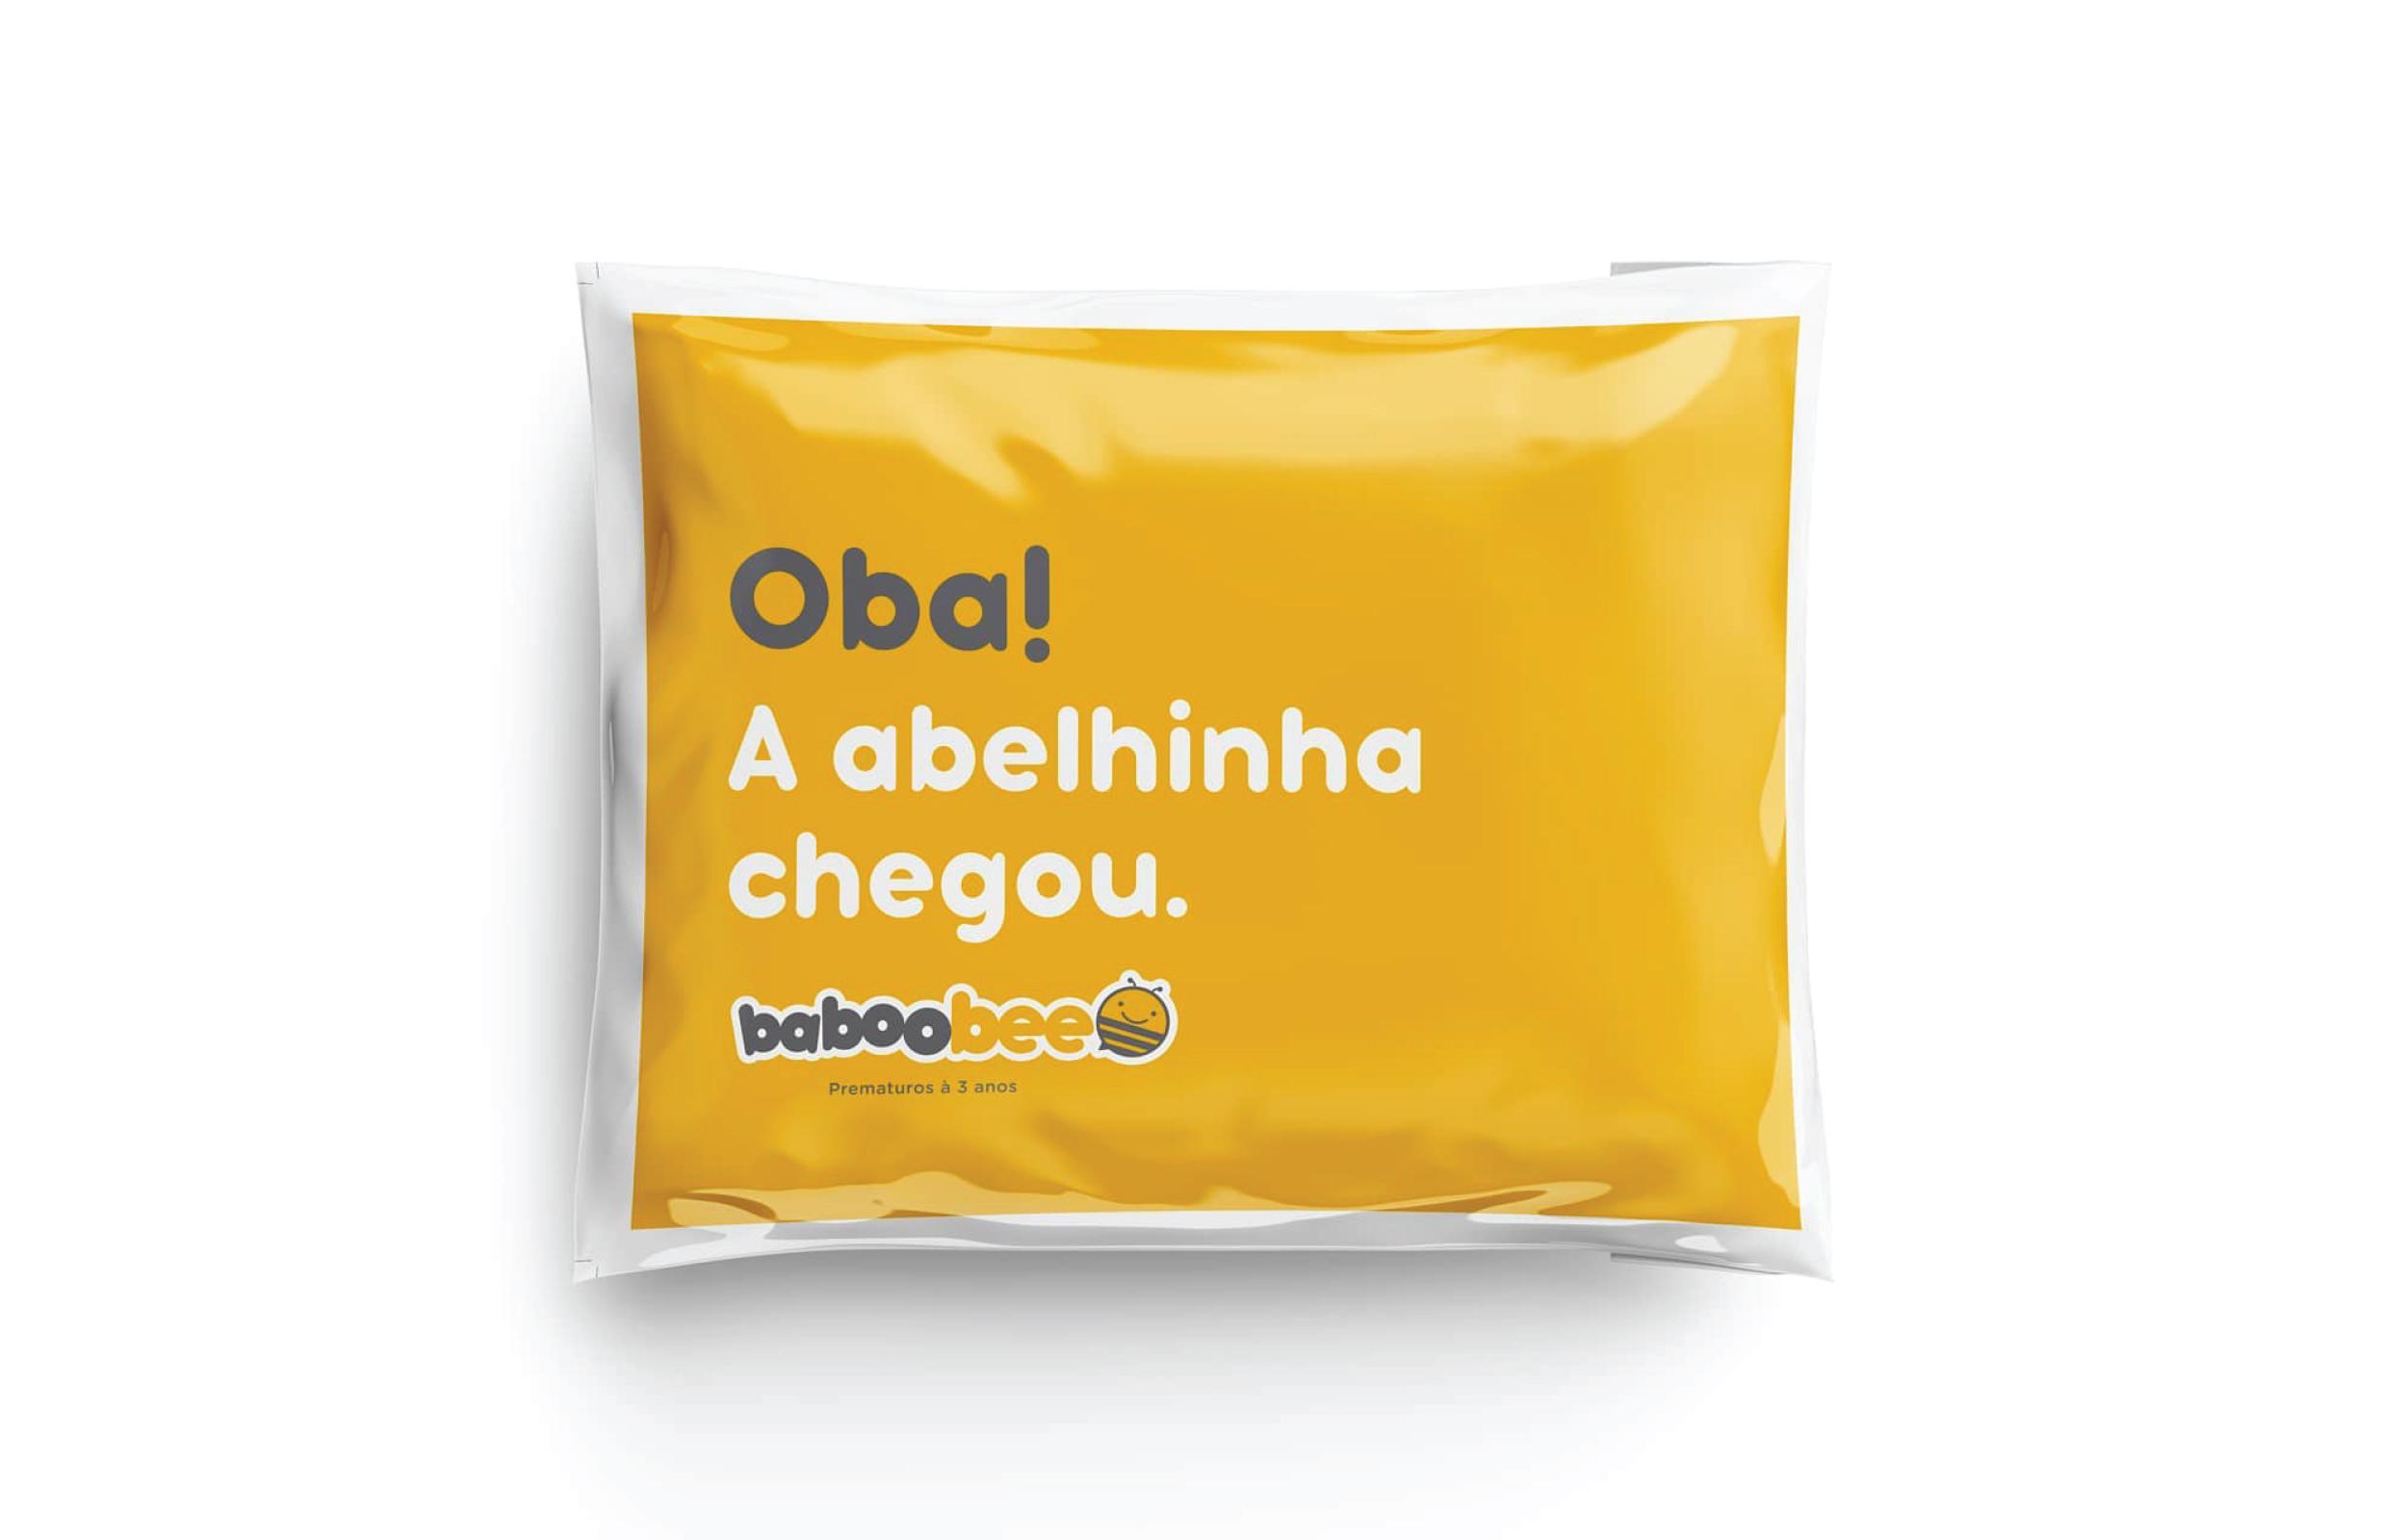 Cliente Baboobee